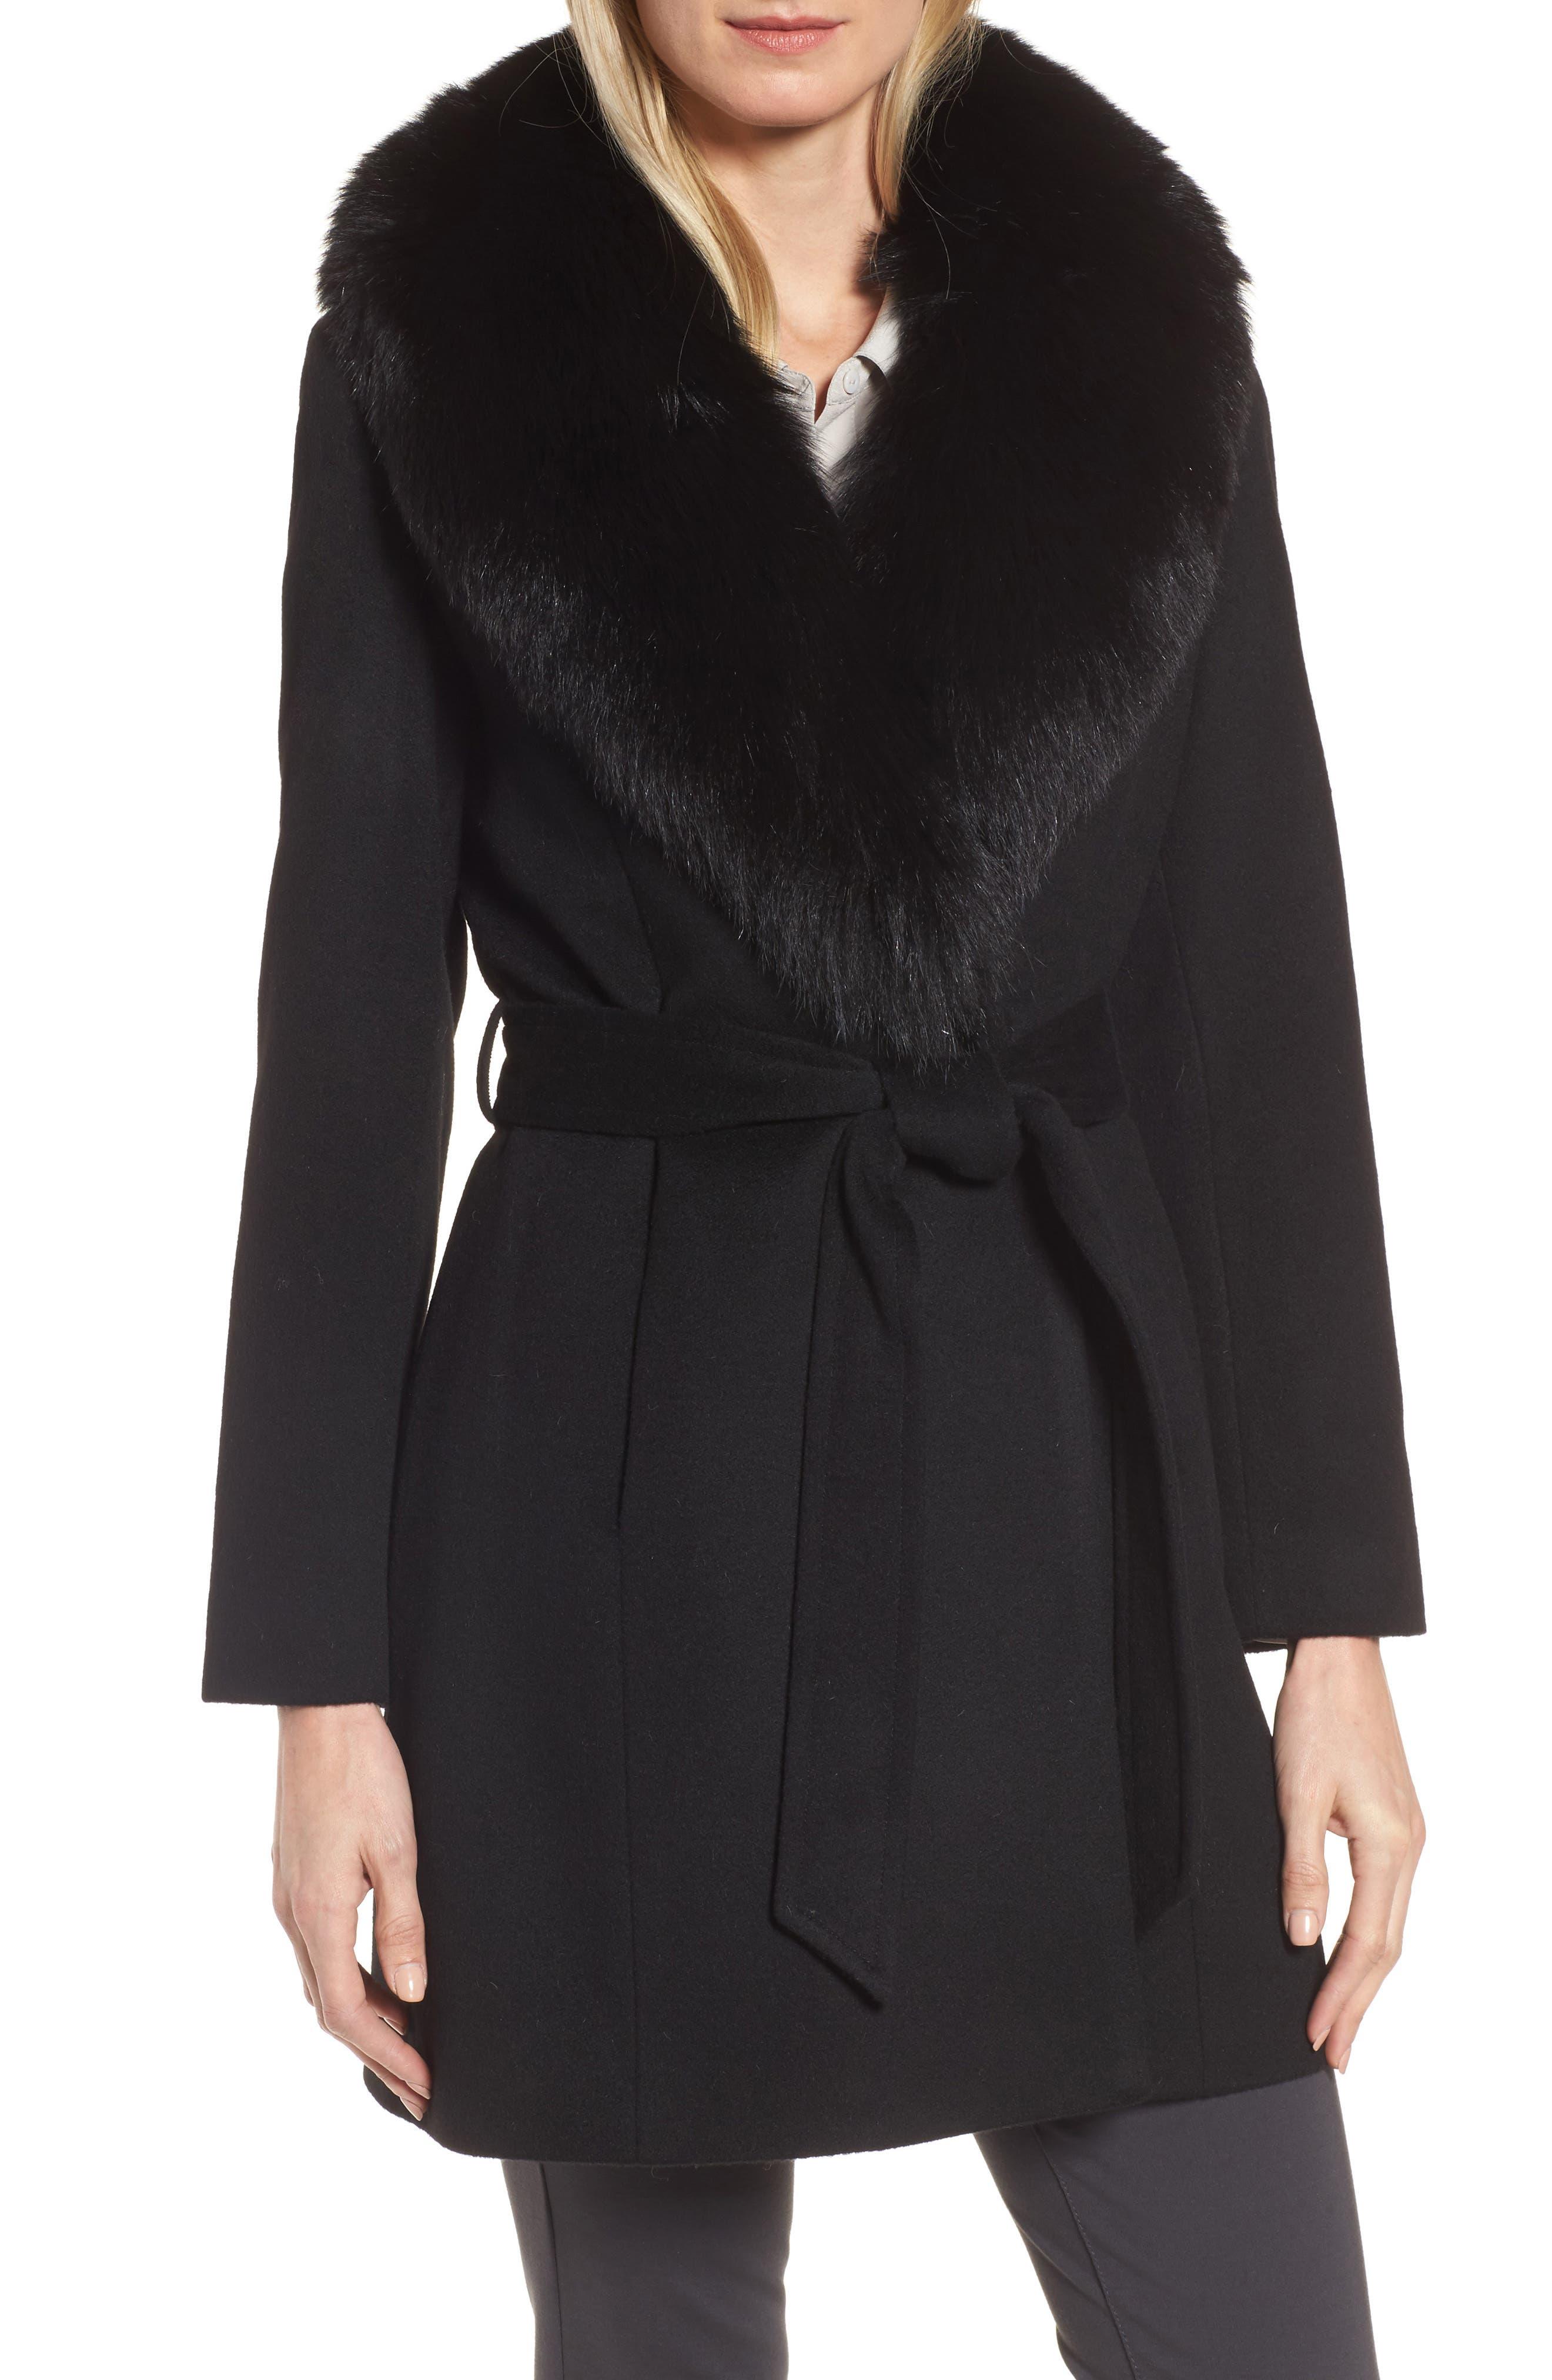 Sofia Cashmere Genuine Fox Fur Lapel Wrap Coat